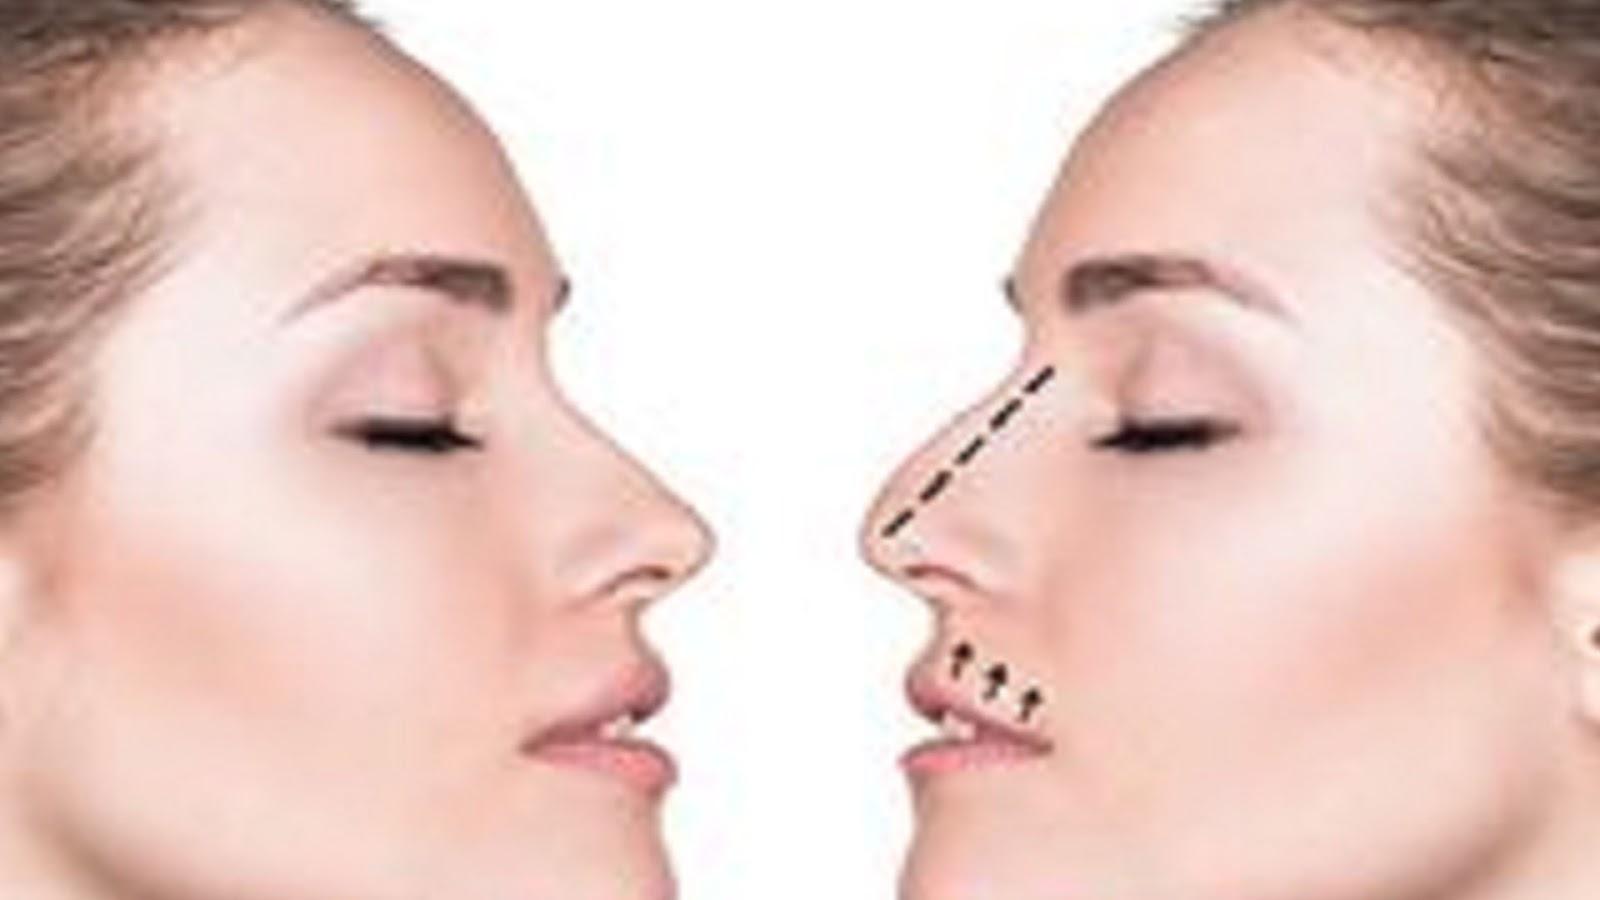 plastic surgery, cosmetic surgery, rhinoplasty, nose job, nose surgery